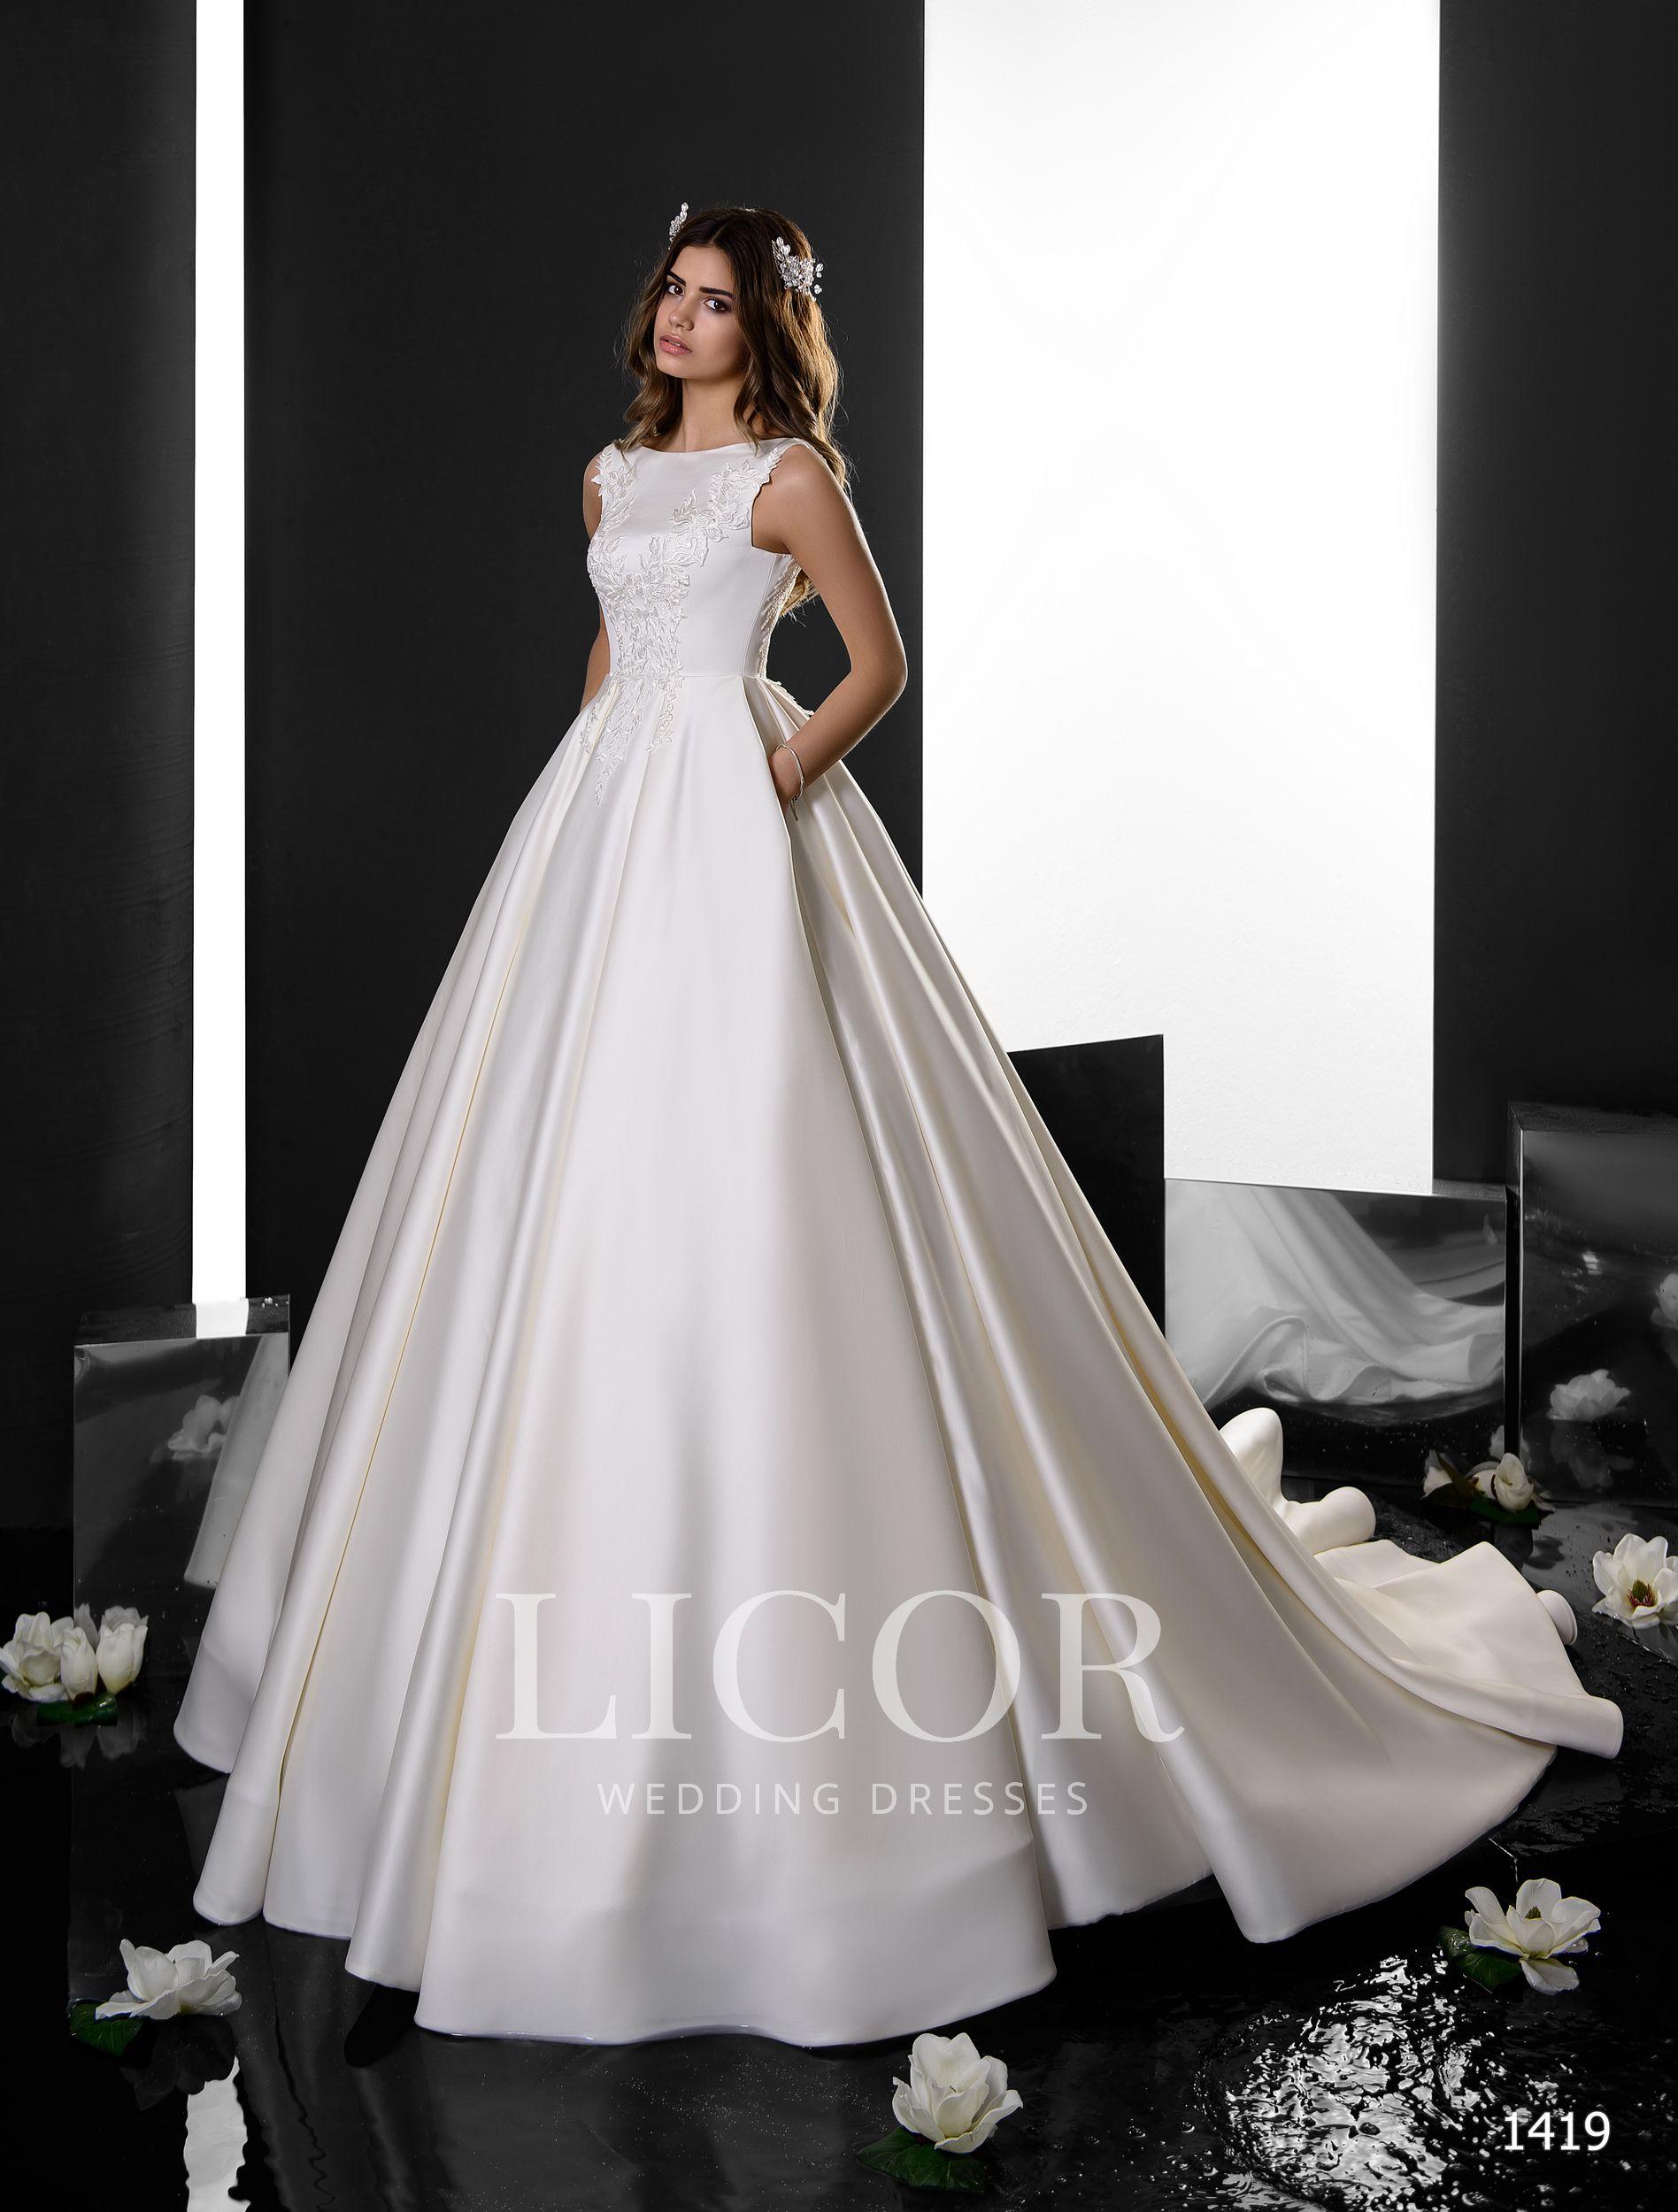 http://licor.com.ua/images/stories/virtuemart/product/1419(1).jpg